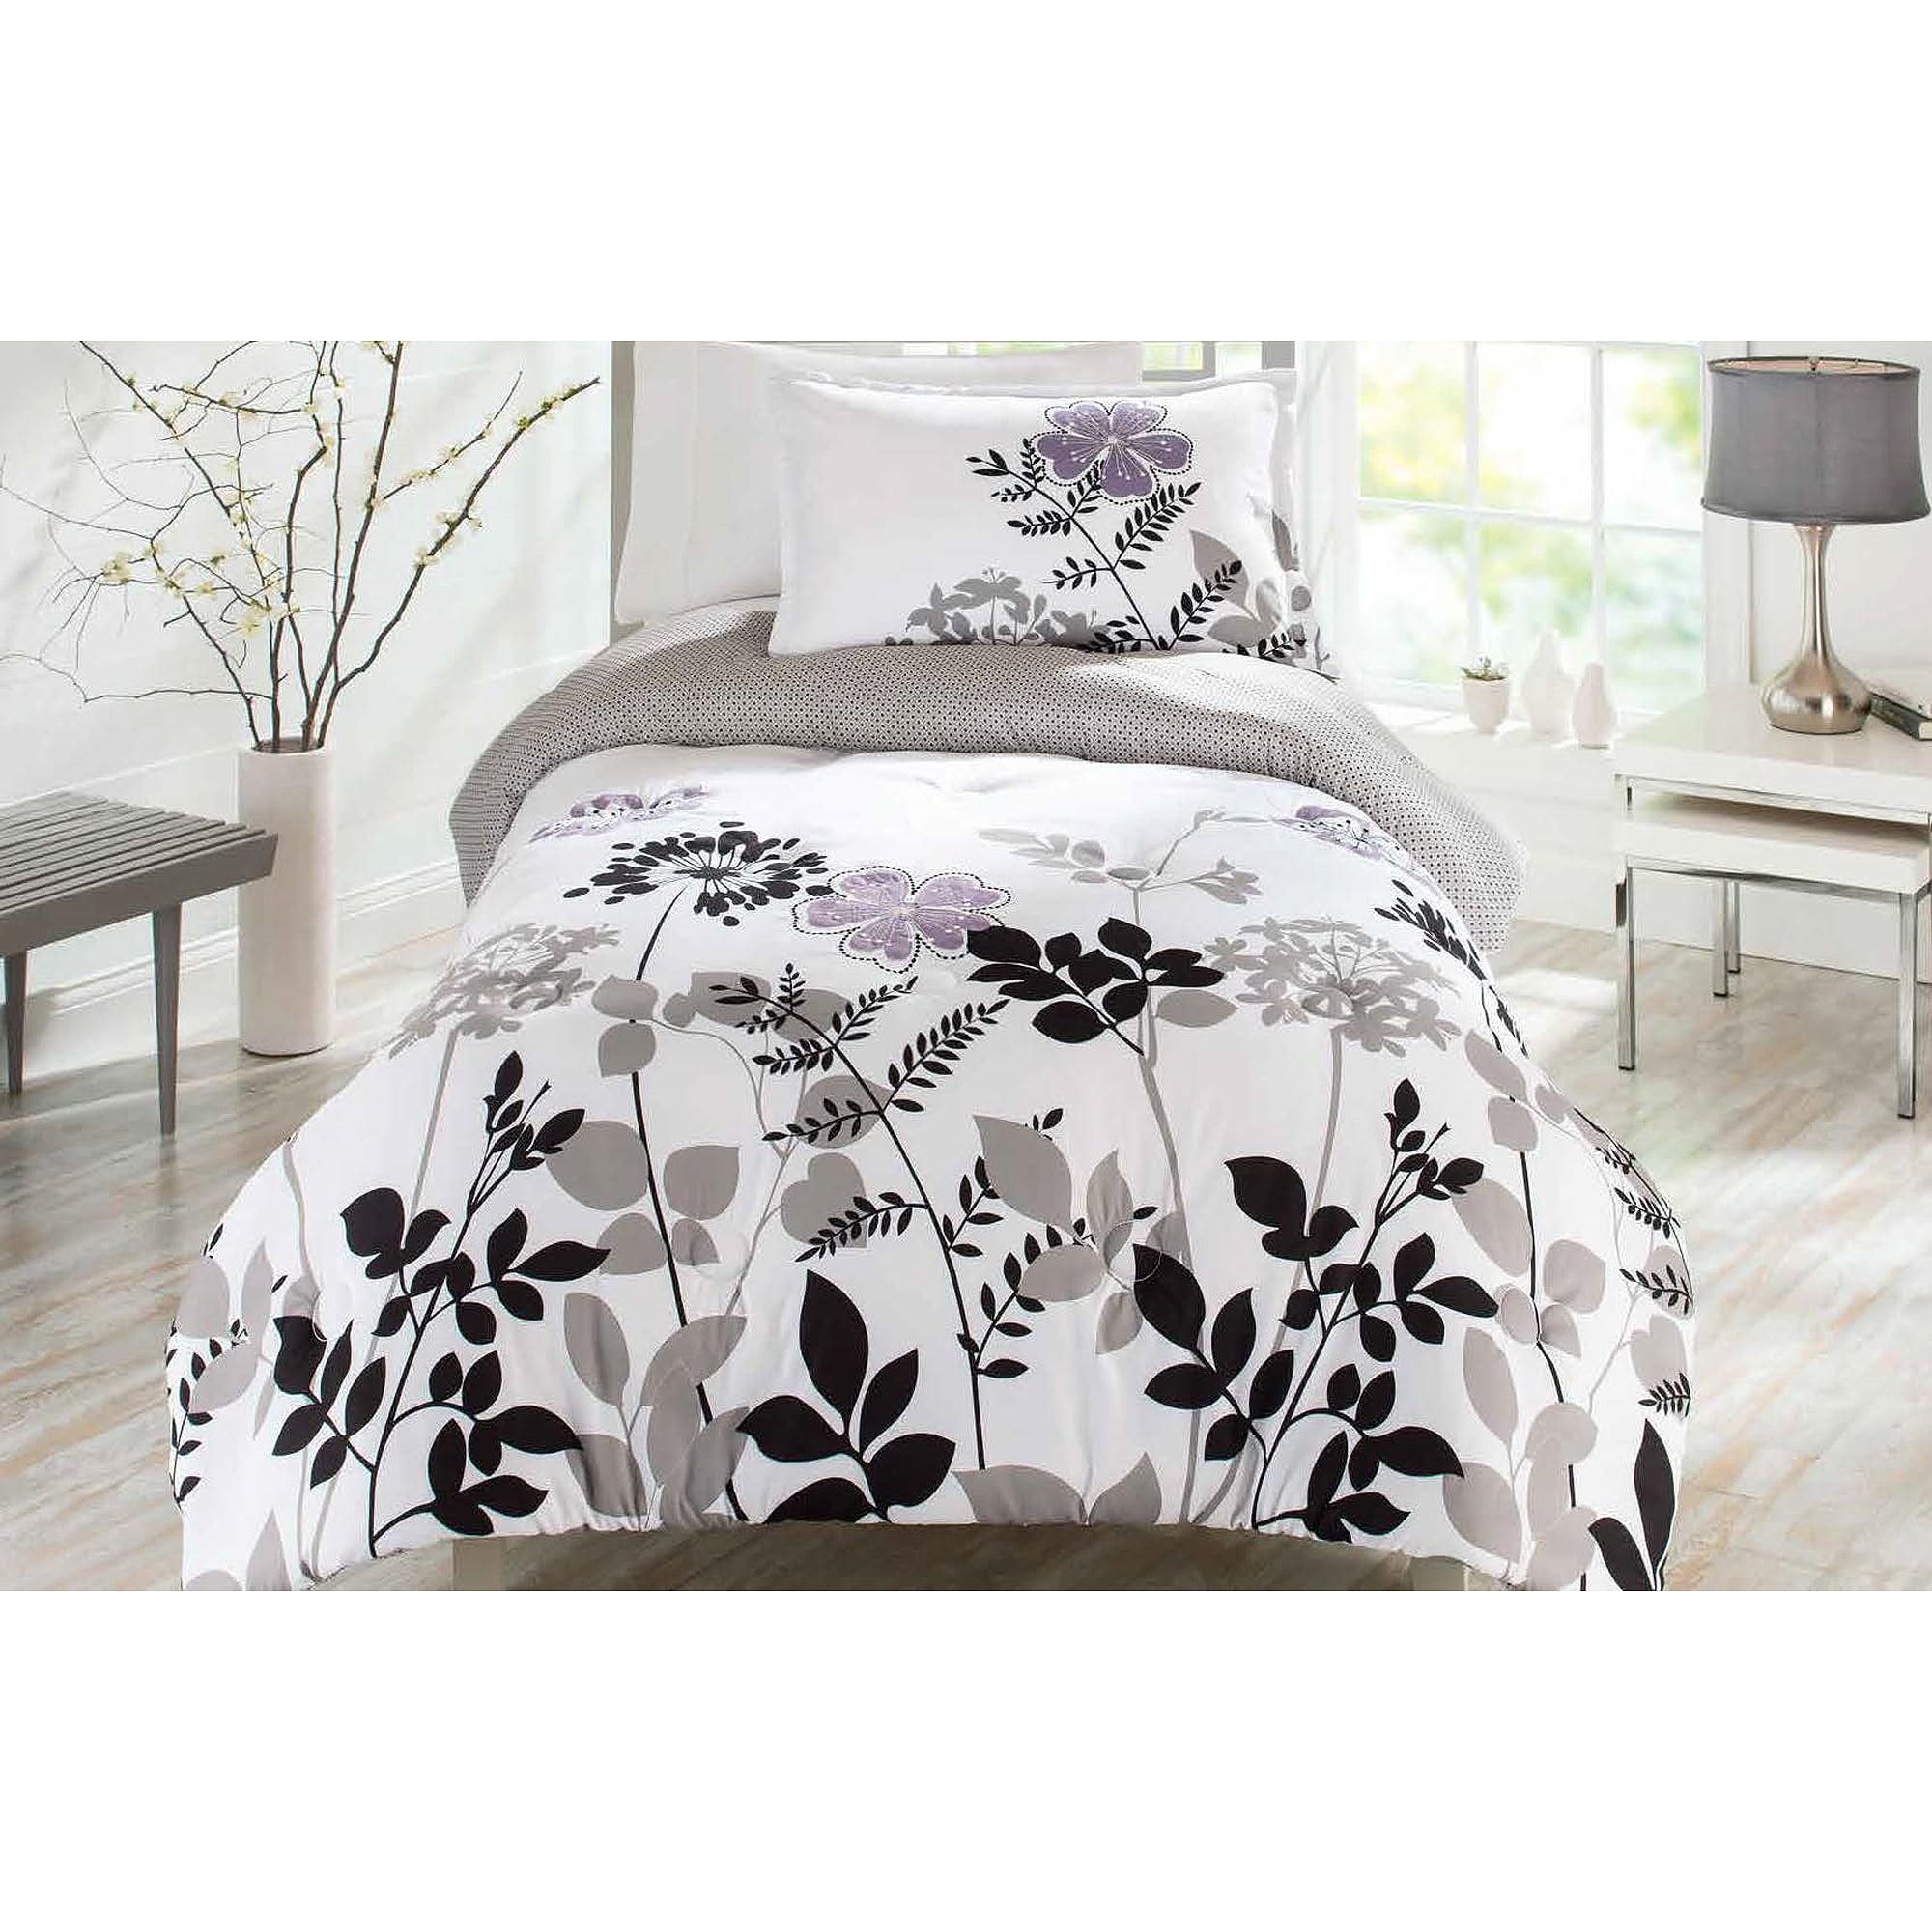 stylish grey elegant comforter pattern c set king warm cozy classic beautiful sets piece size color